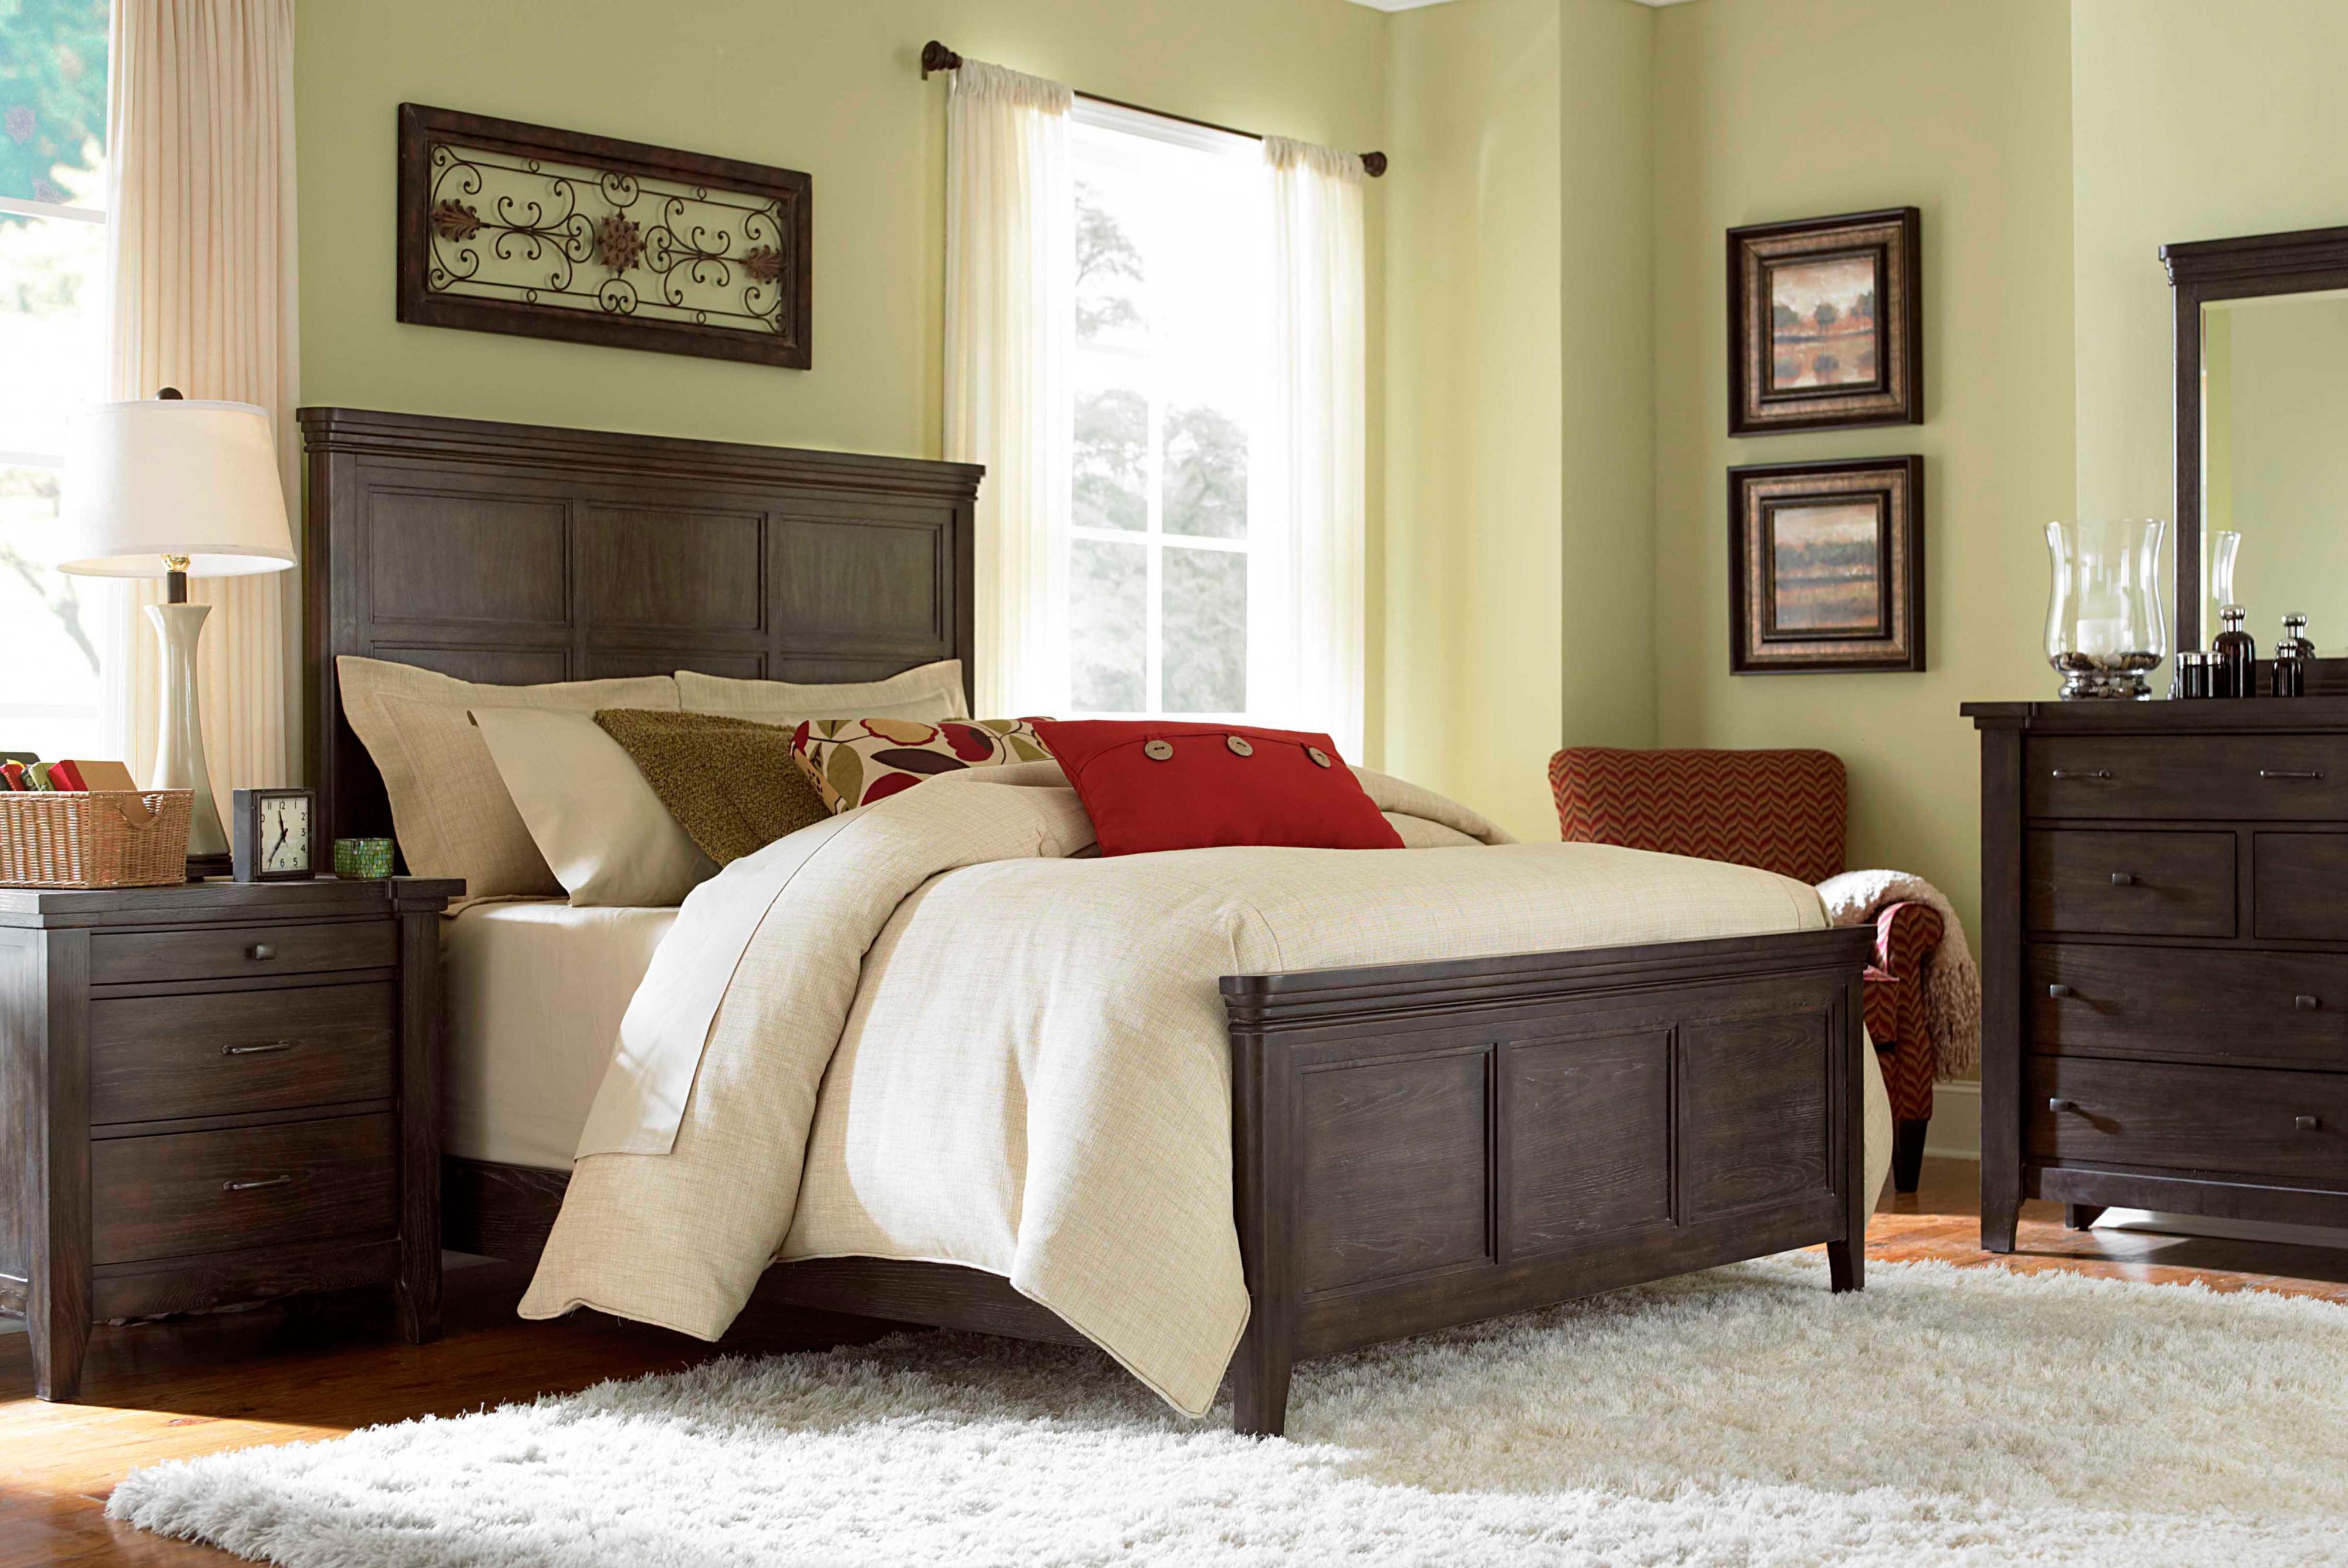 broyhill bedroom furniture broyhill bedroom | broyhill beds | white washed bedroom furniture VQUTCMA